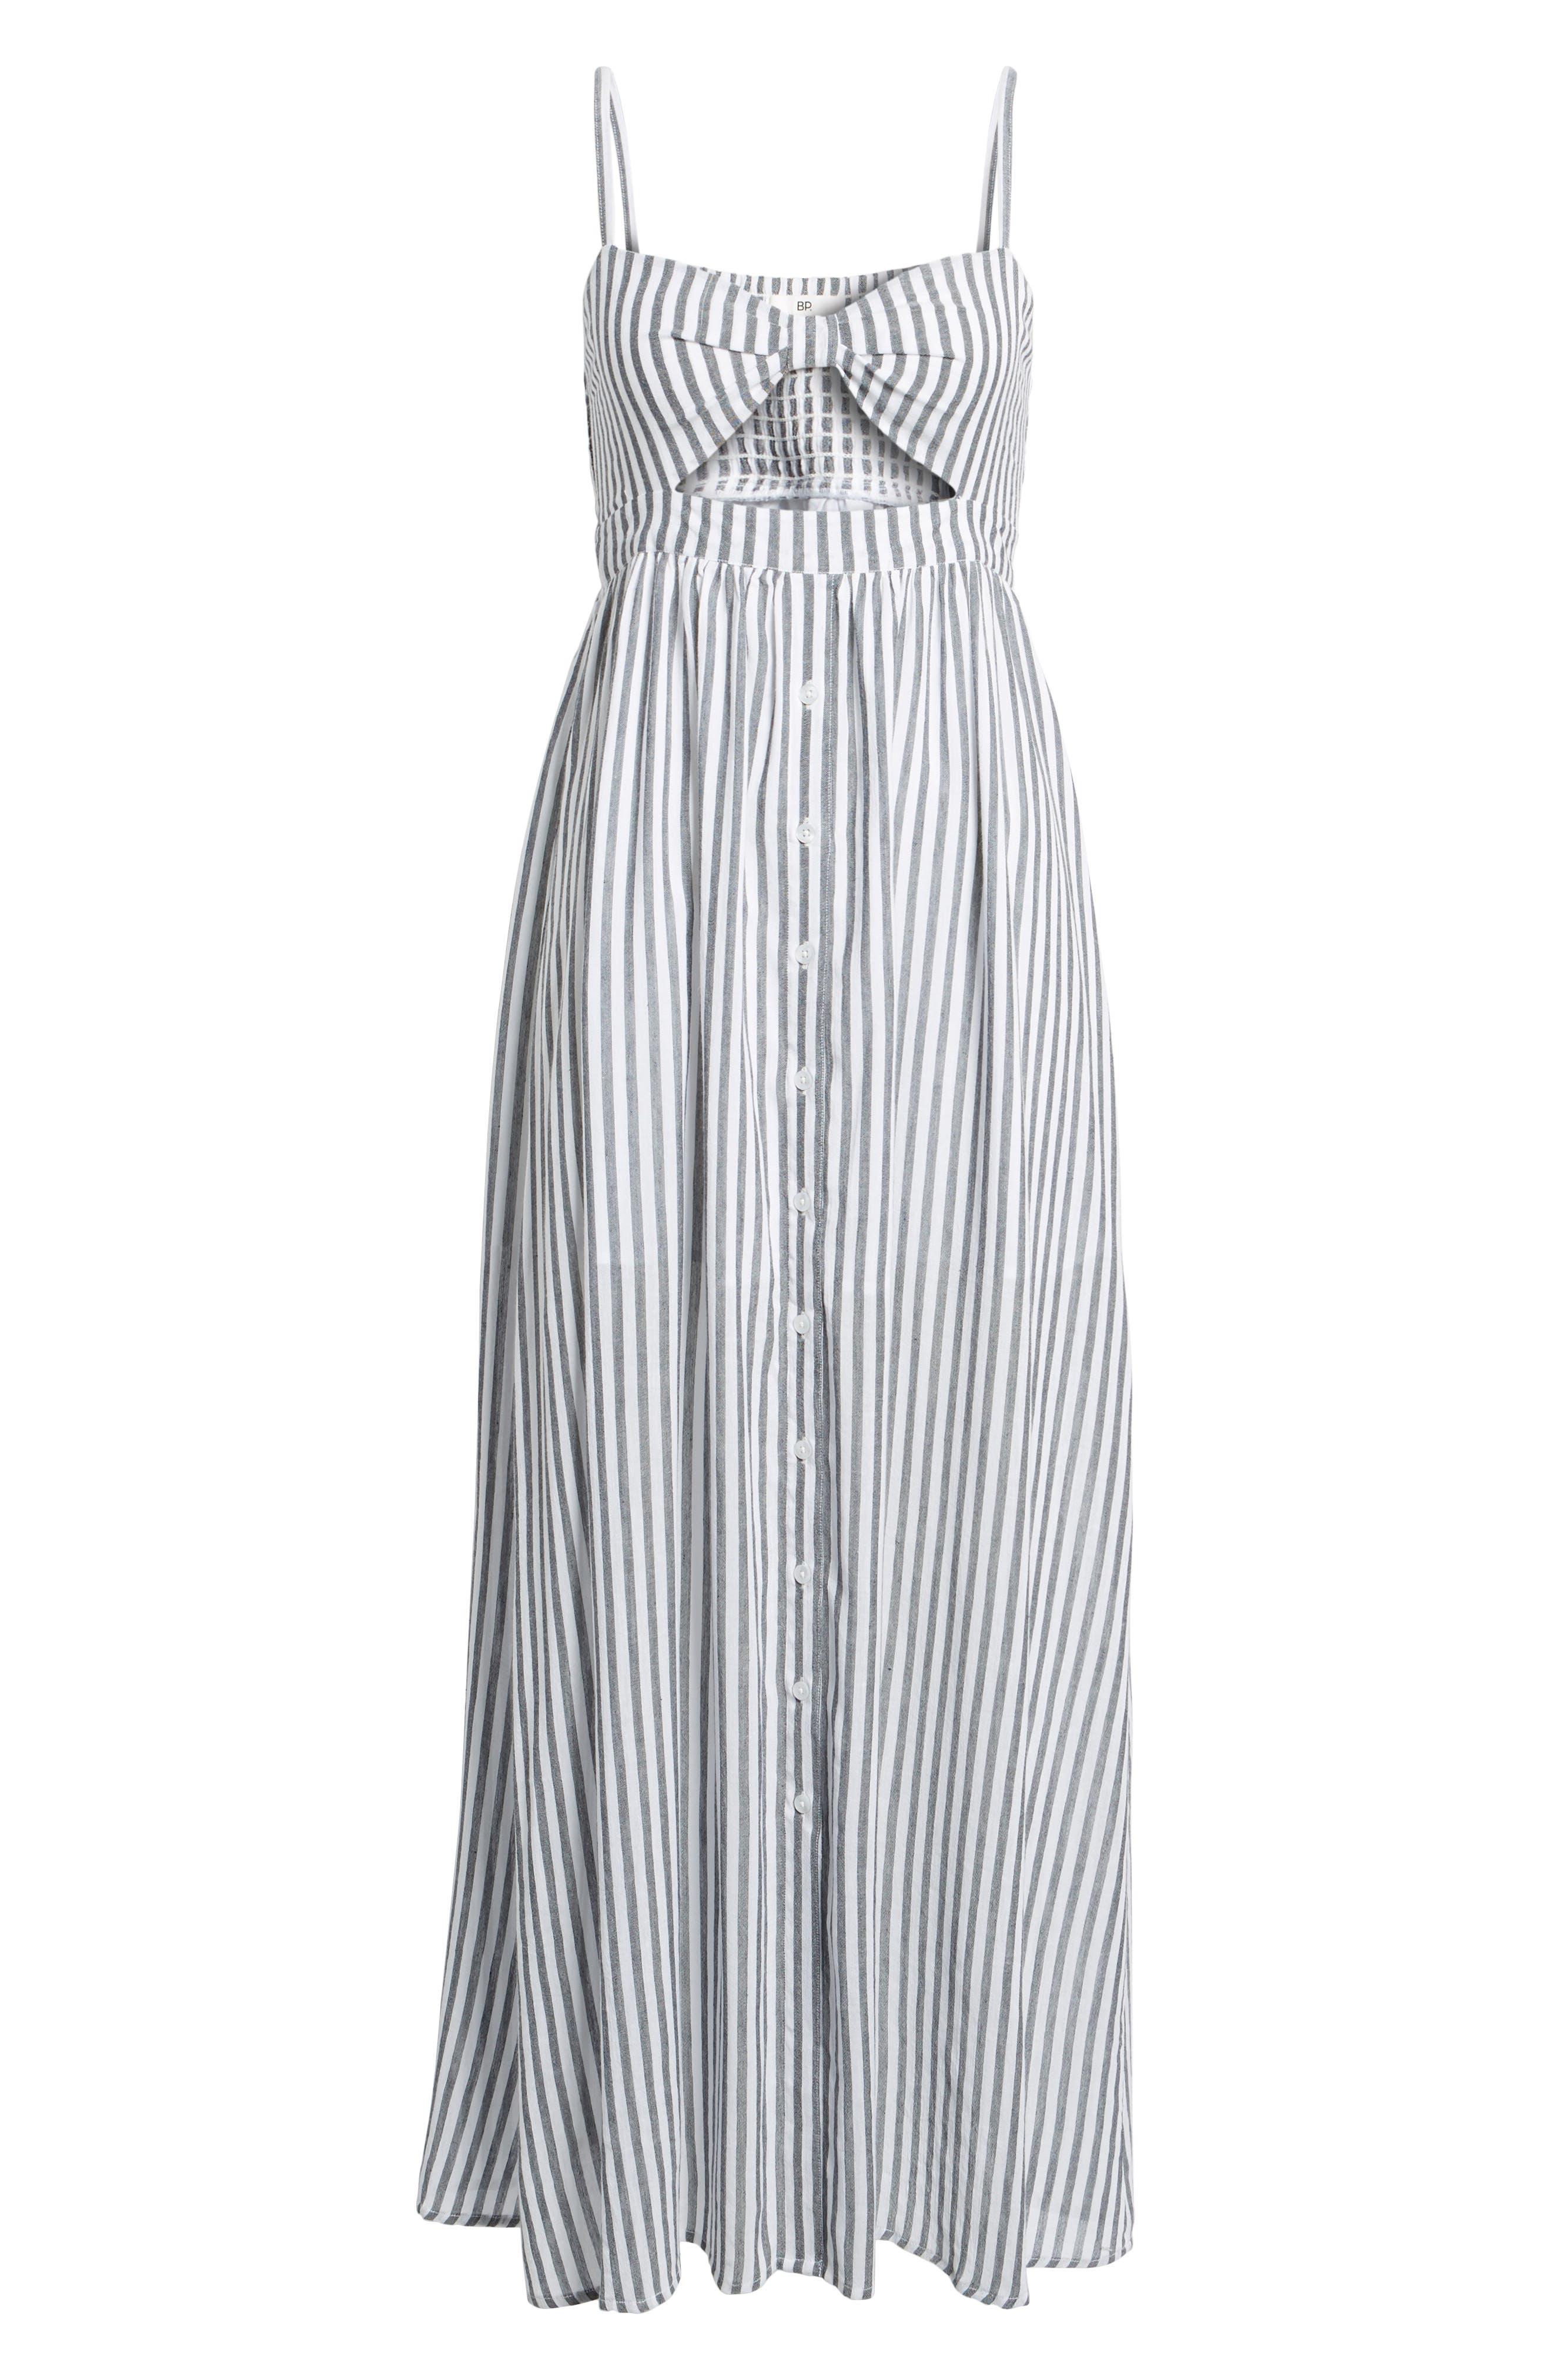 Stripe Button Front Maxi Dress,                             Alternate thumbnail 6, color,                             White City Stripe